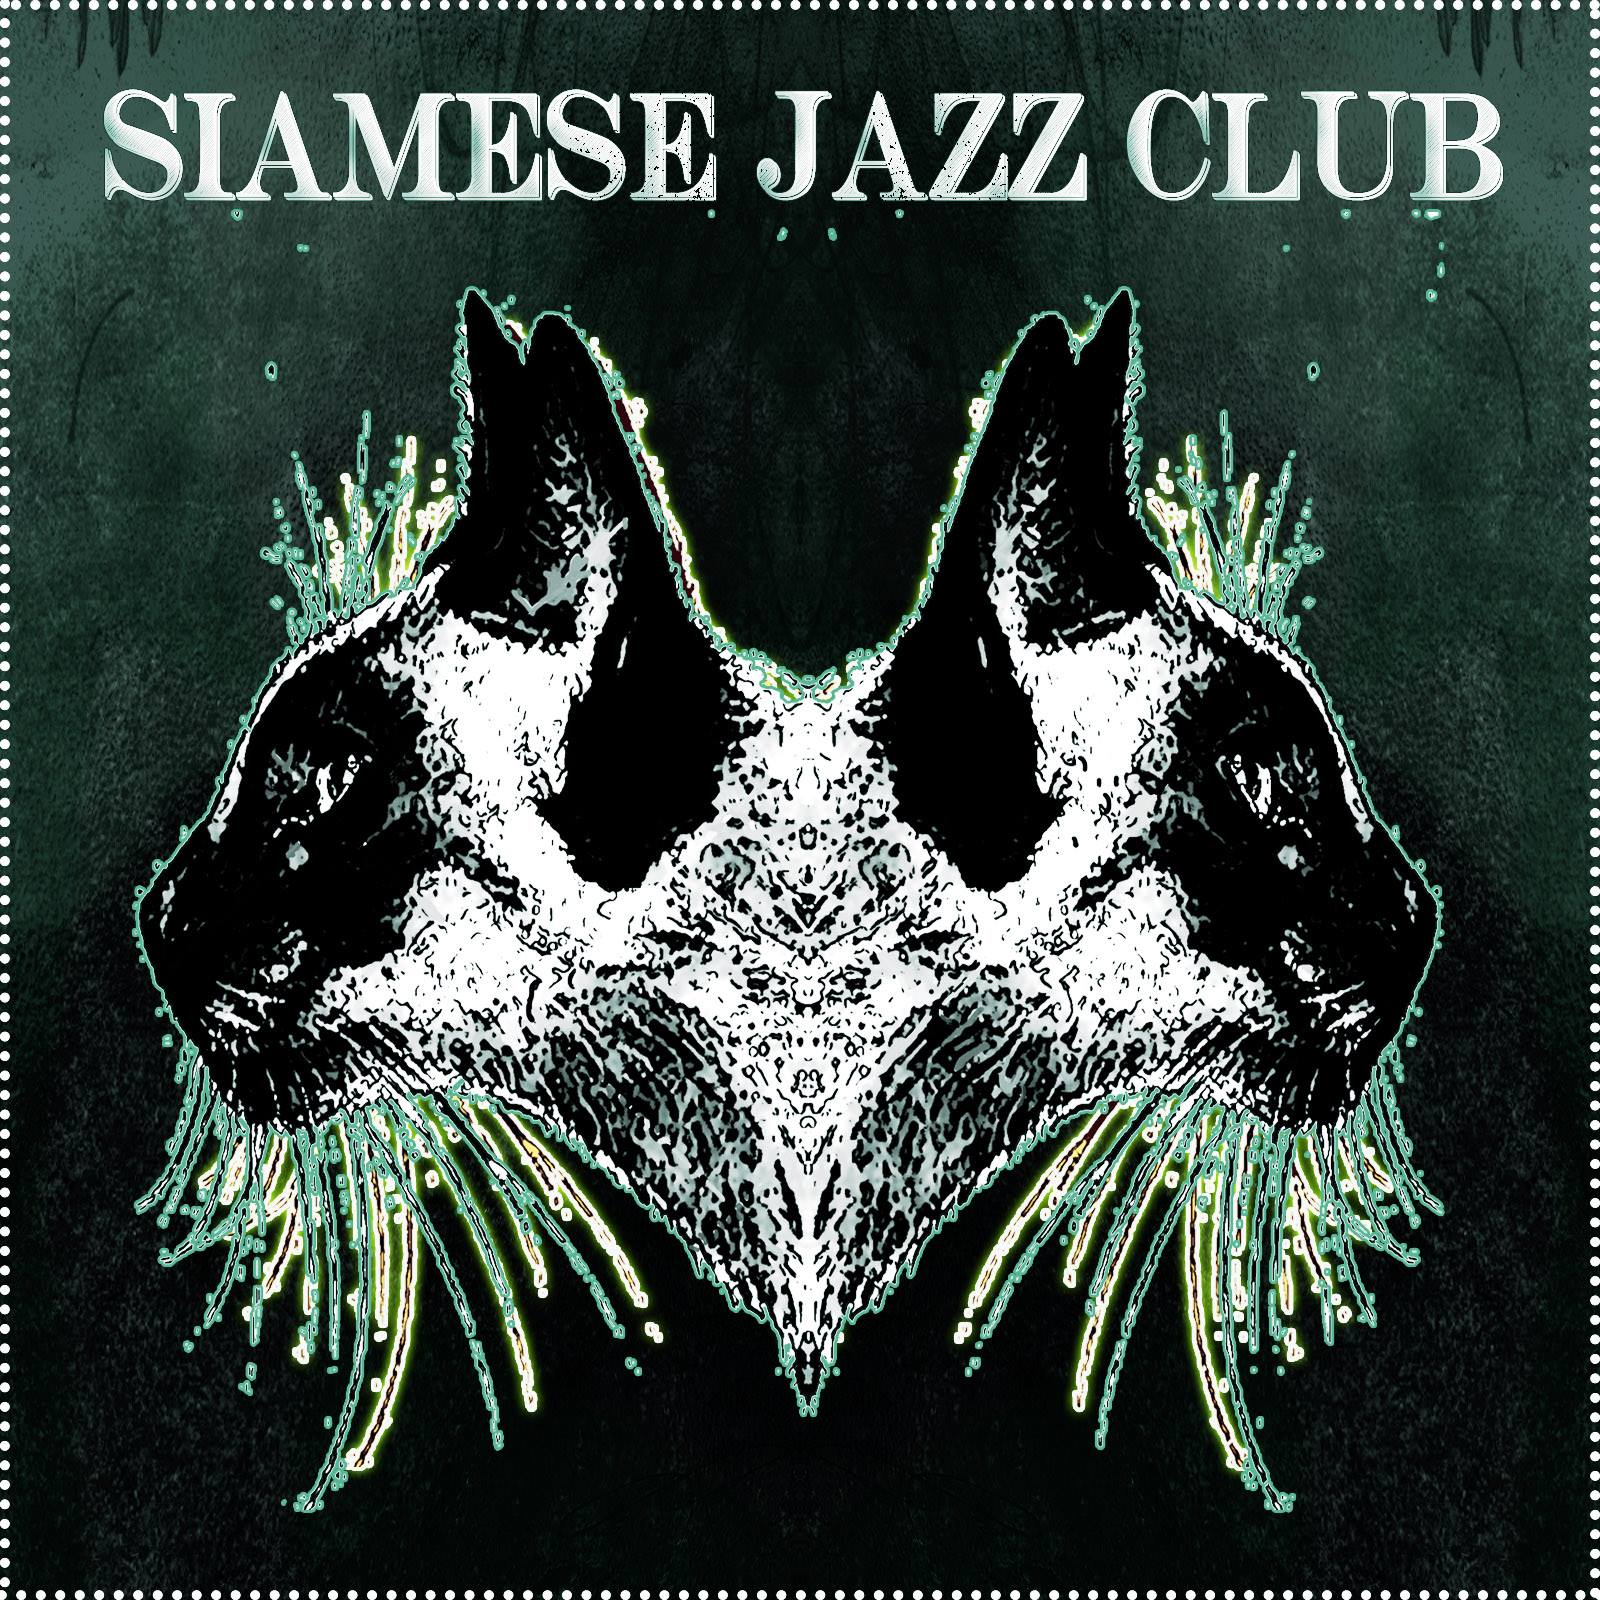 SiameseJazzClub-SalvageStation.jpg